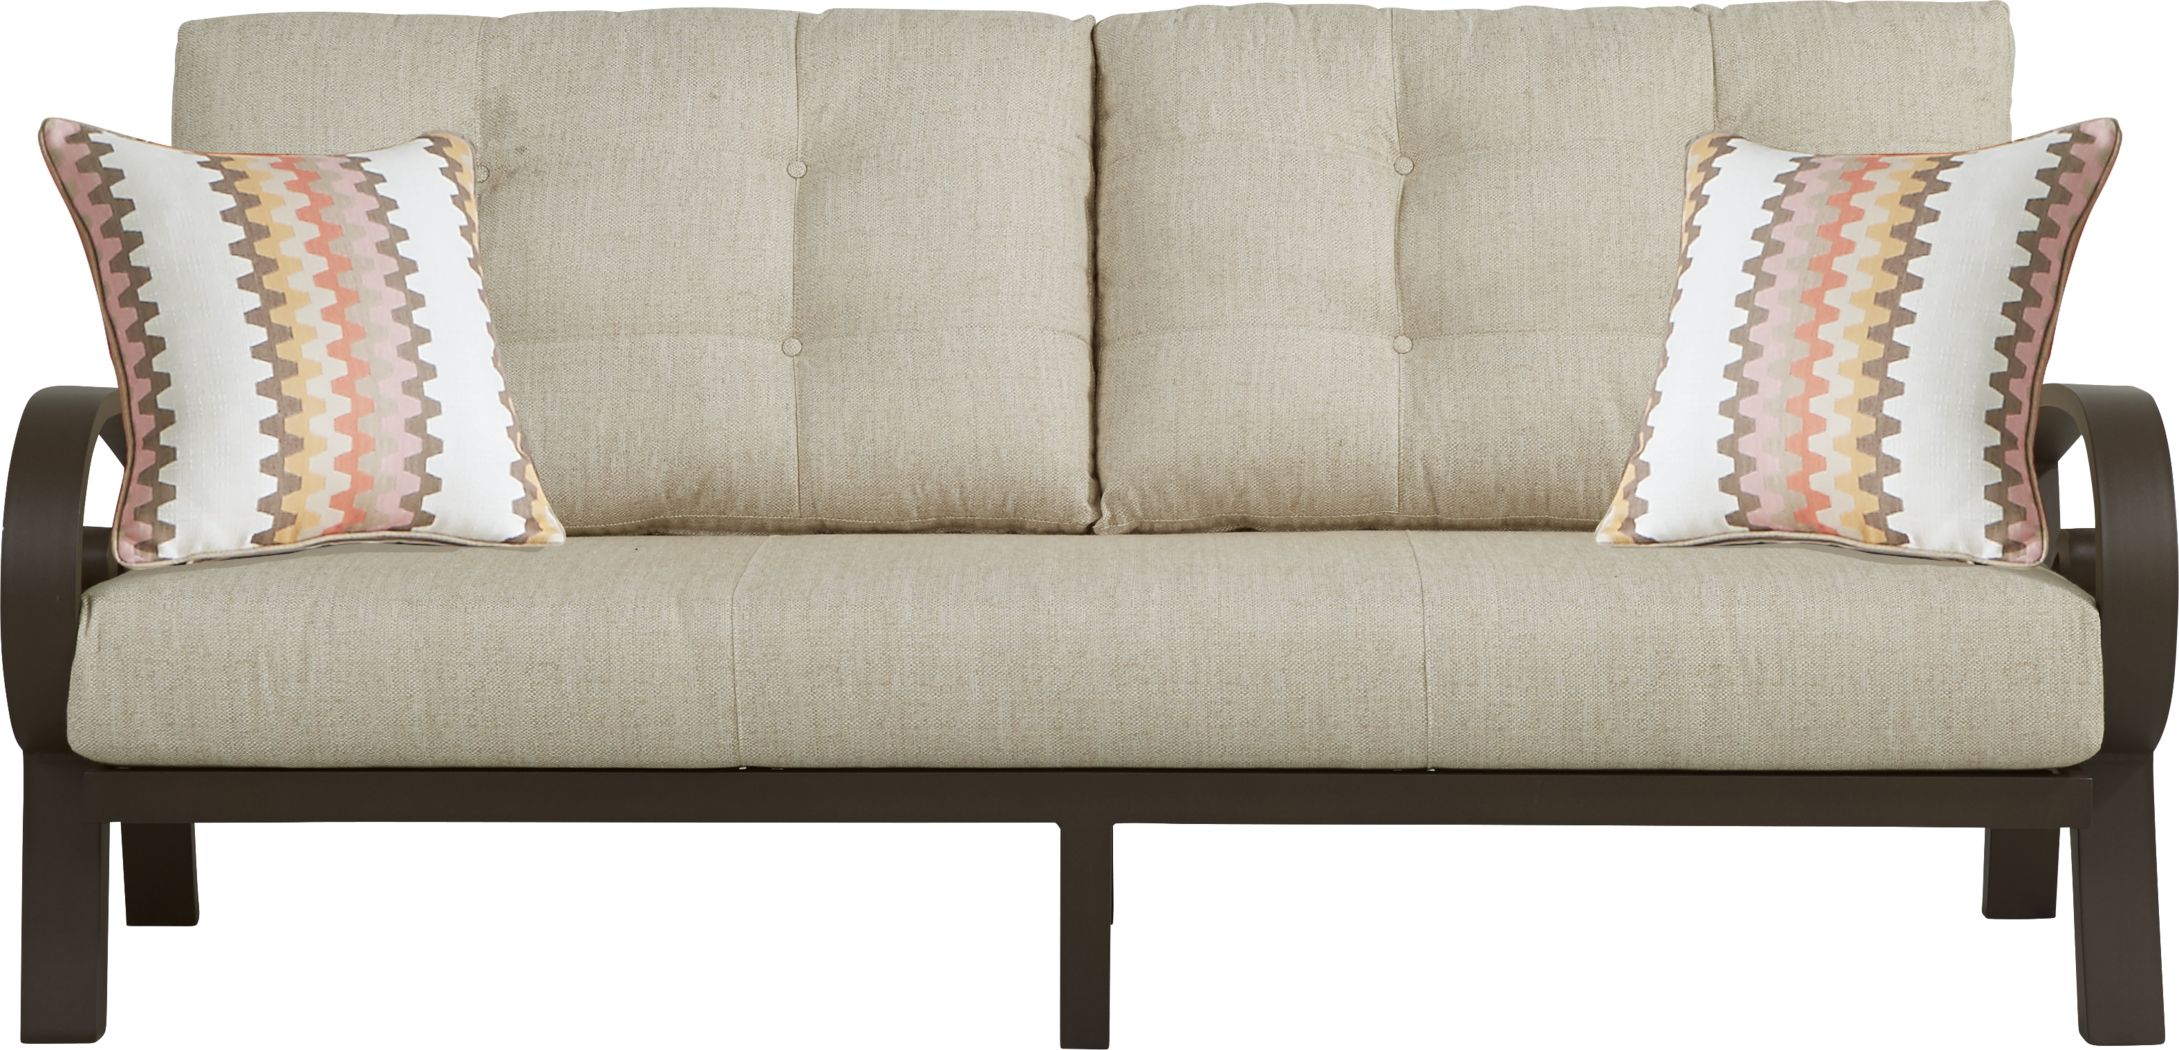 Bermuda Bay Aged Bronze Outdoor Sofa with Wren Cushions